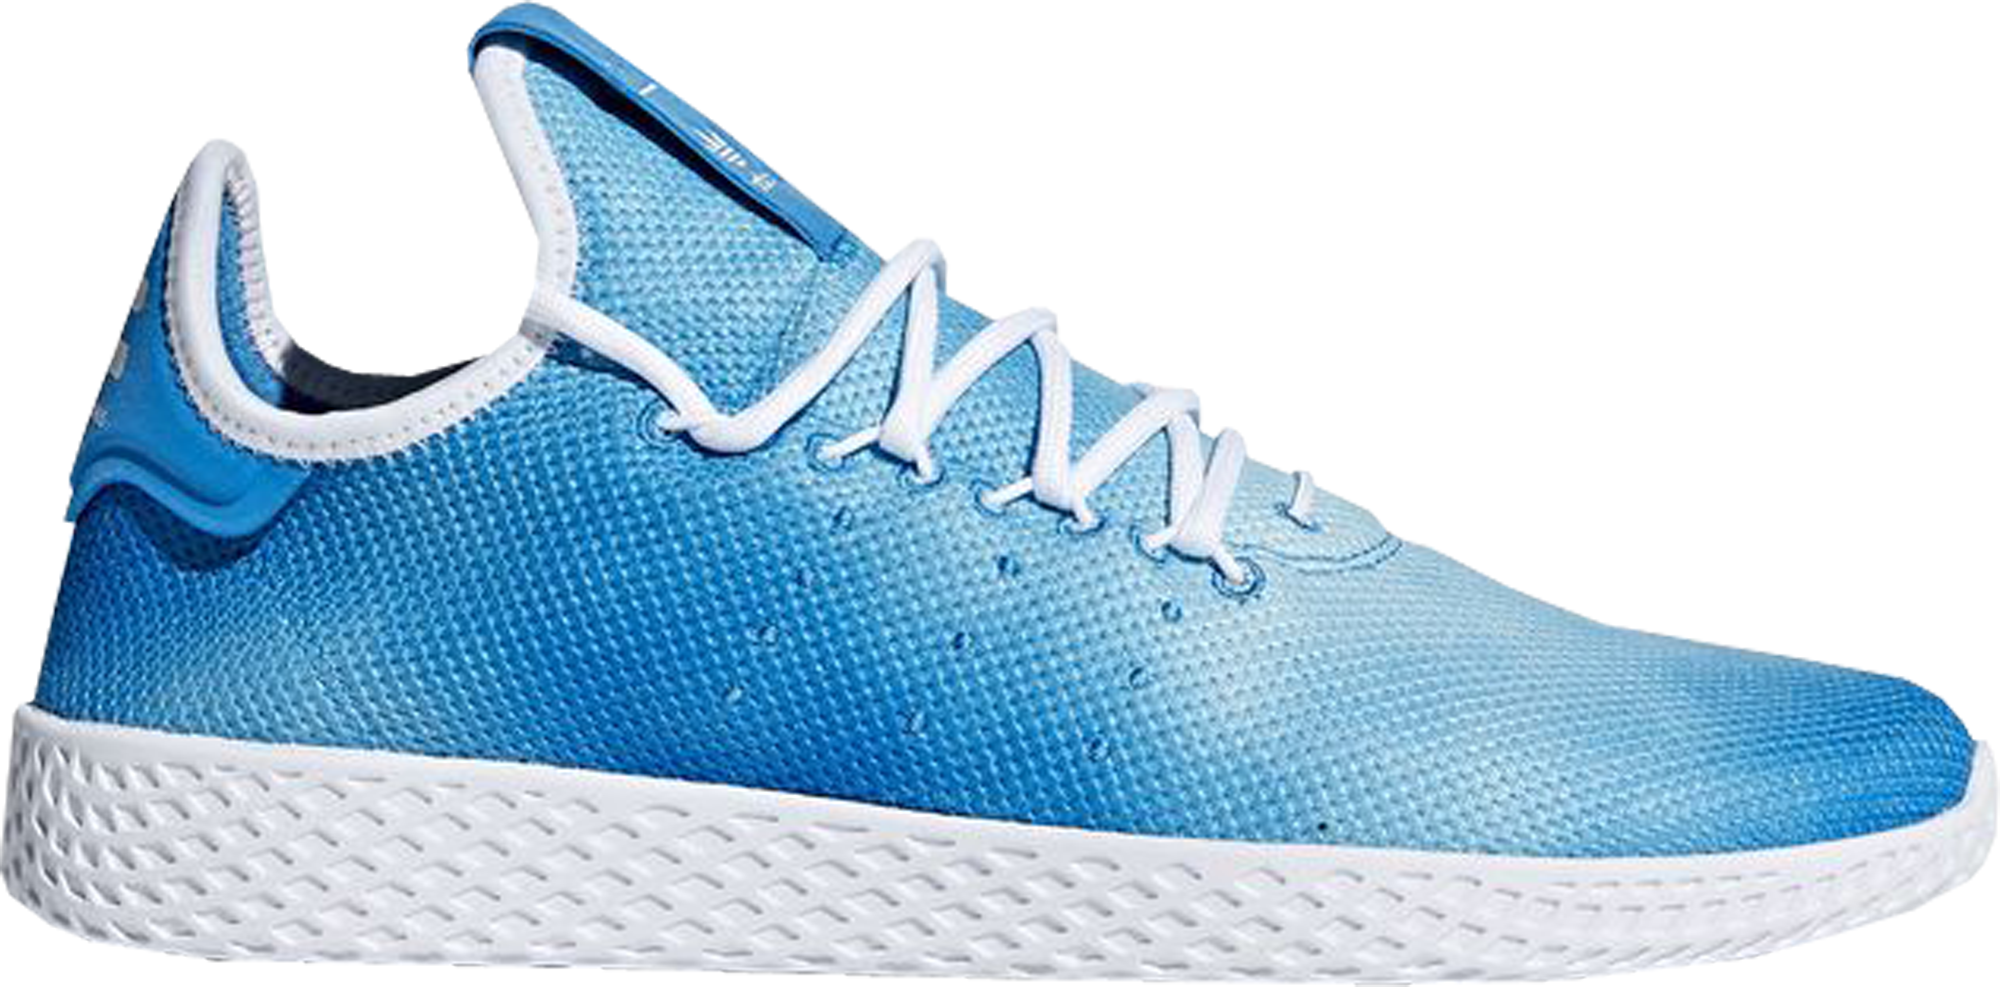 adidas Tennis HU Holi Blue